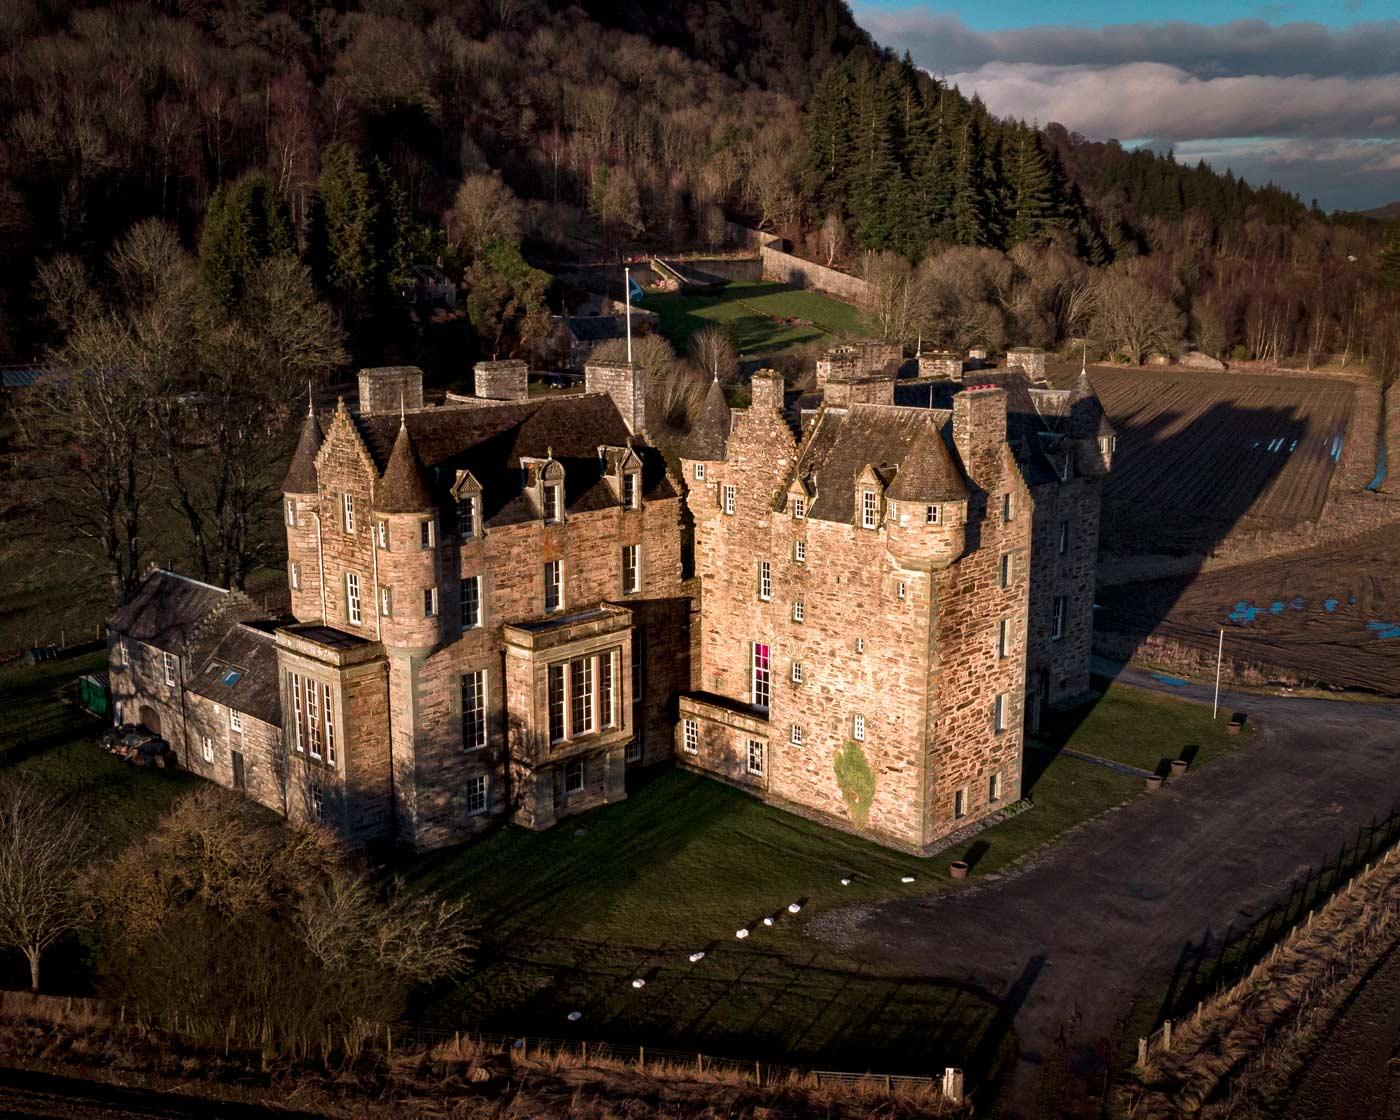 Angus M Hulbert - Castle Menzies Aglow